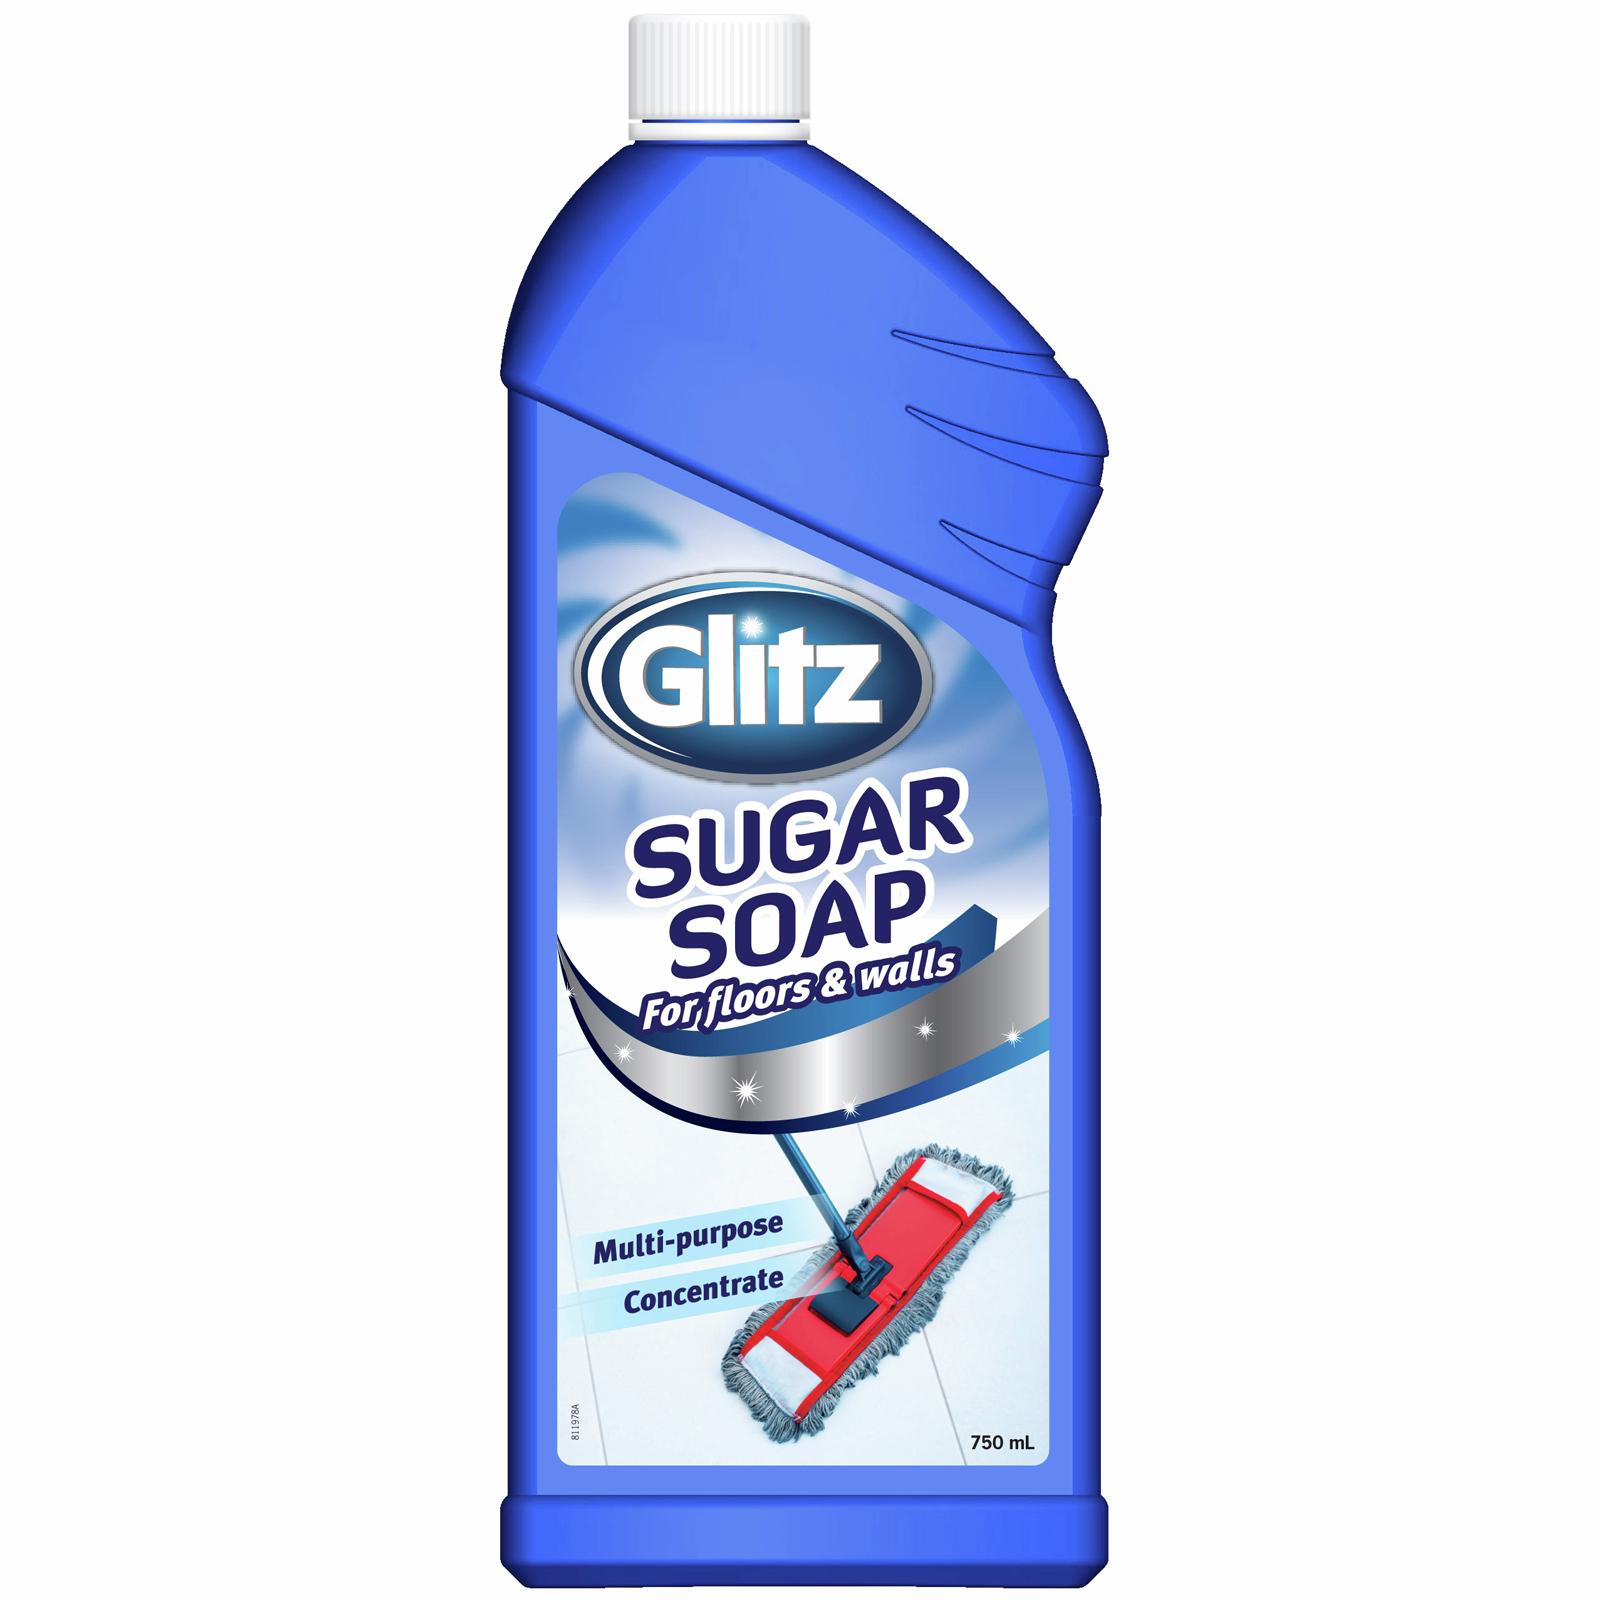 Glitz 750ml Sugar Soap For Floors